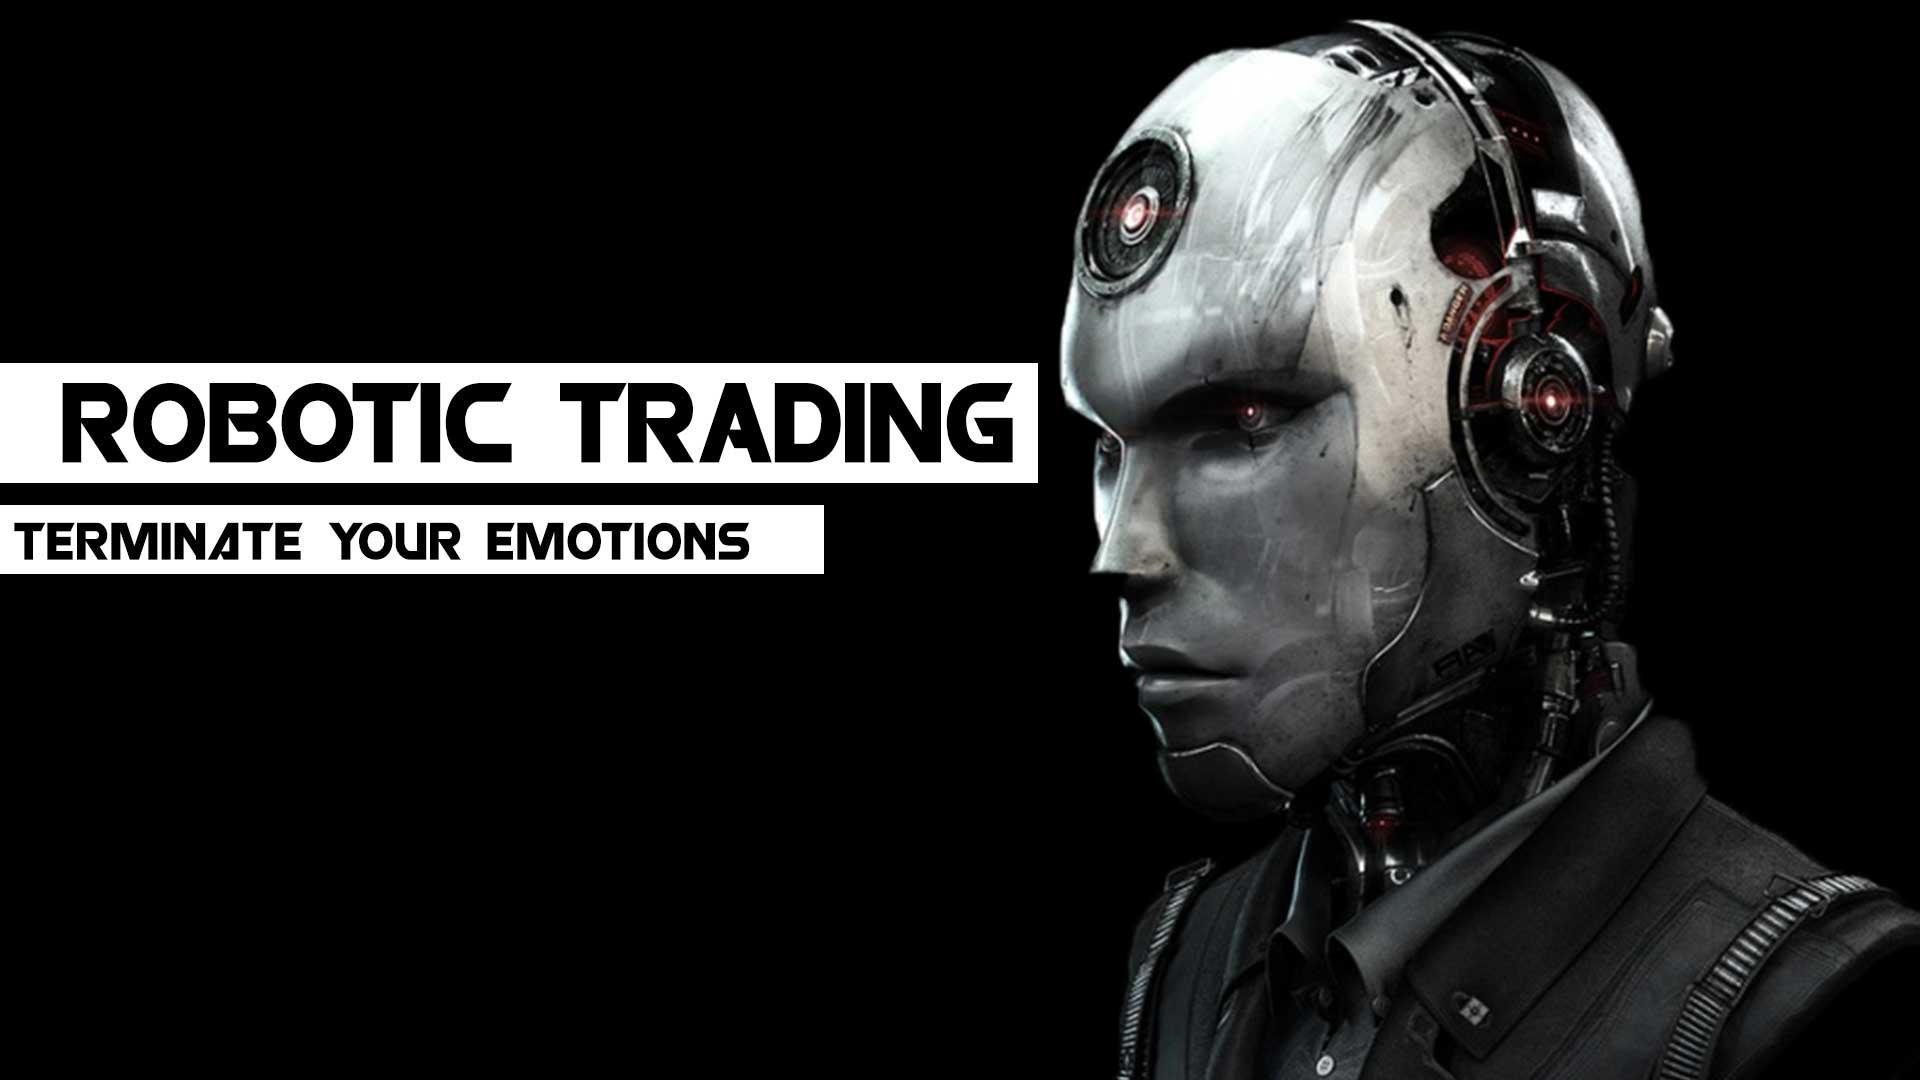 [Mega Link] ClayTrader – Robotic Trading